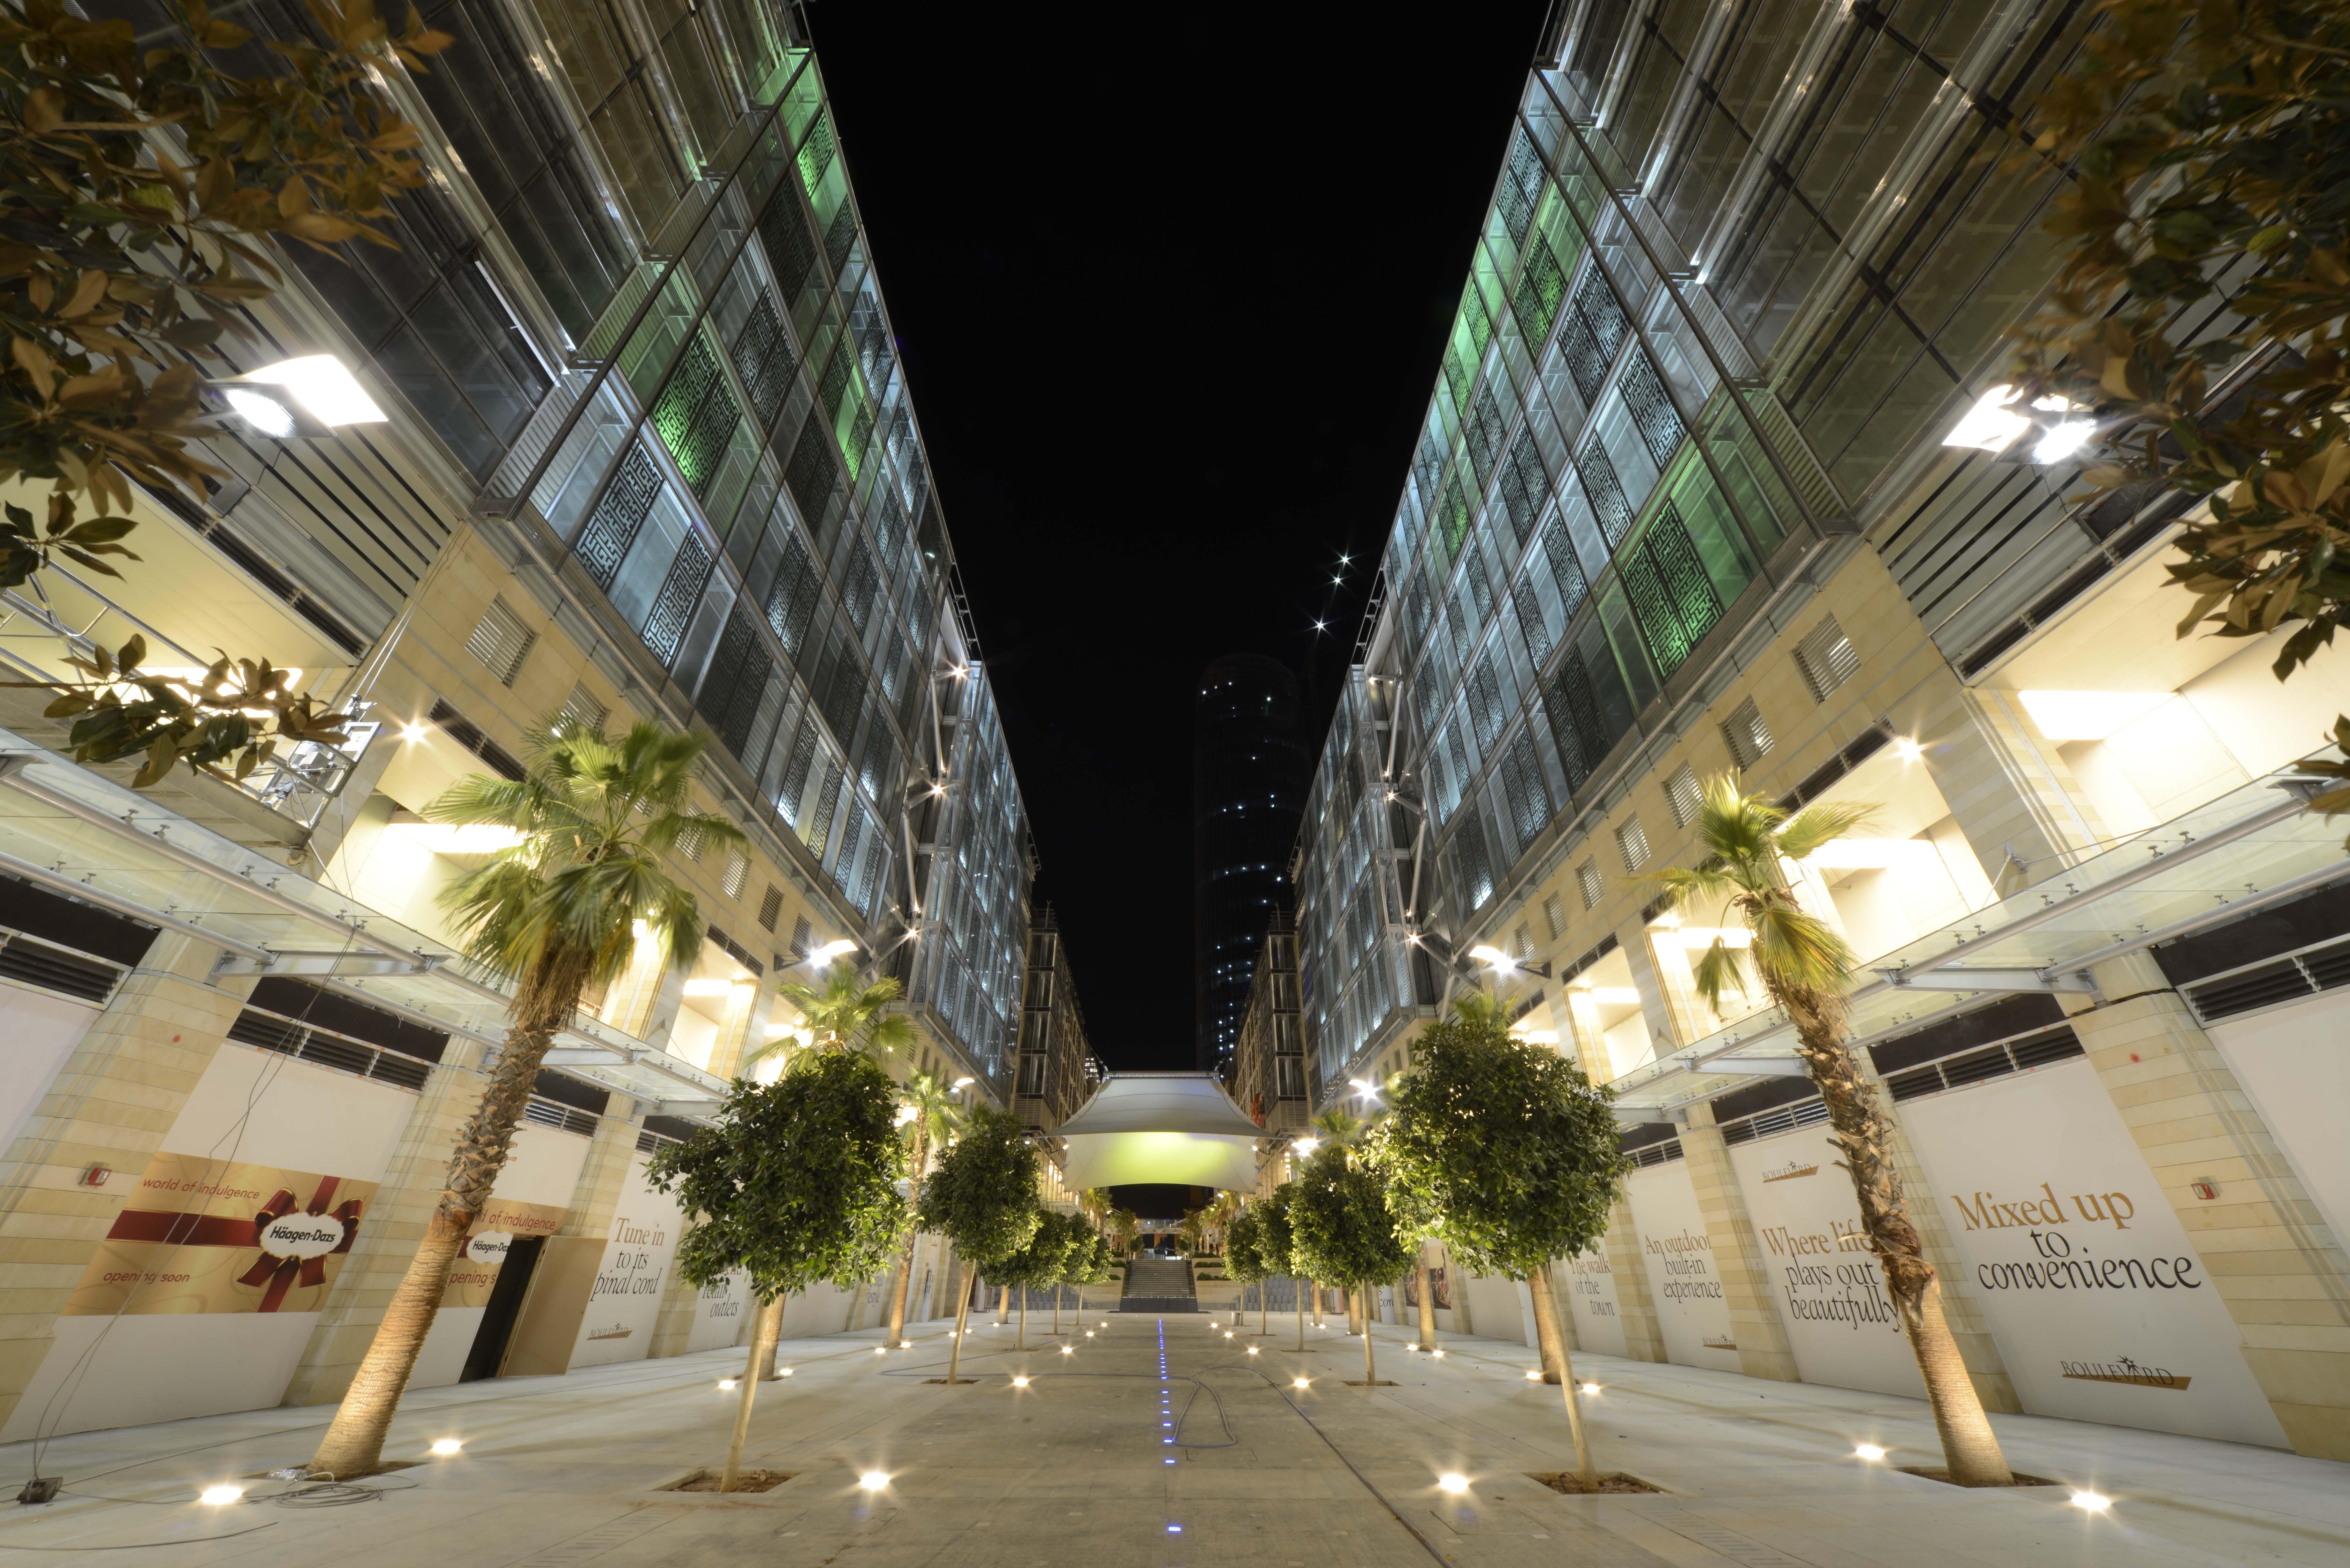 The Abdali Boulevard